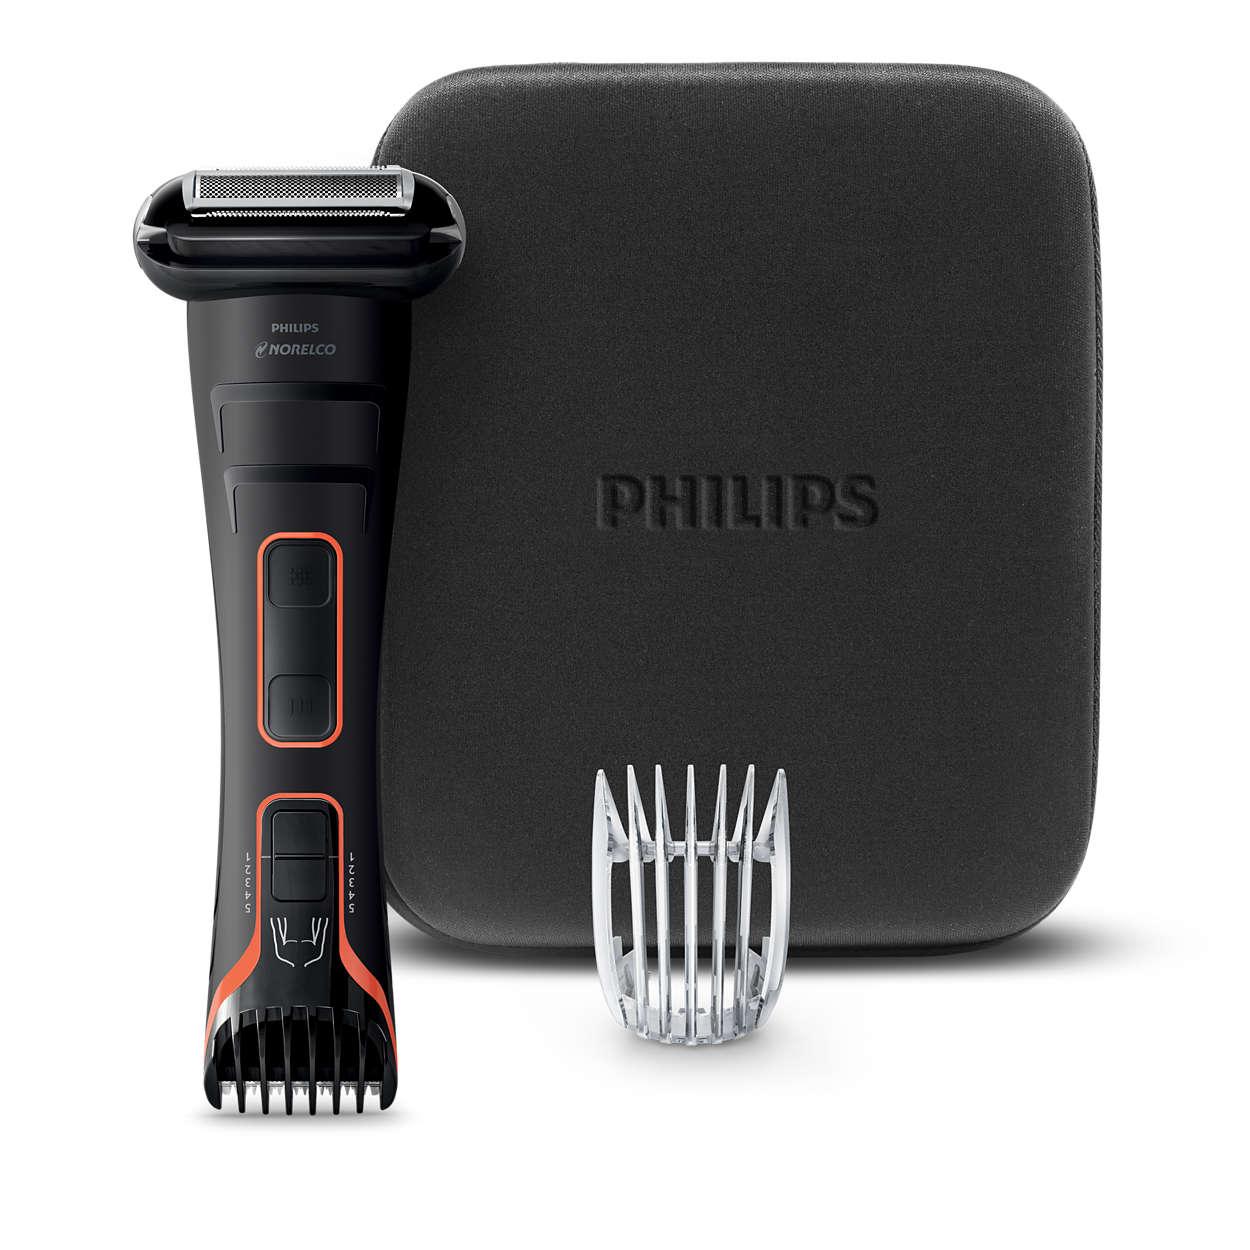 Fast trim, precise shave